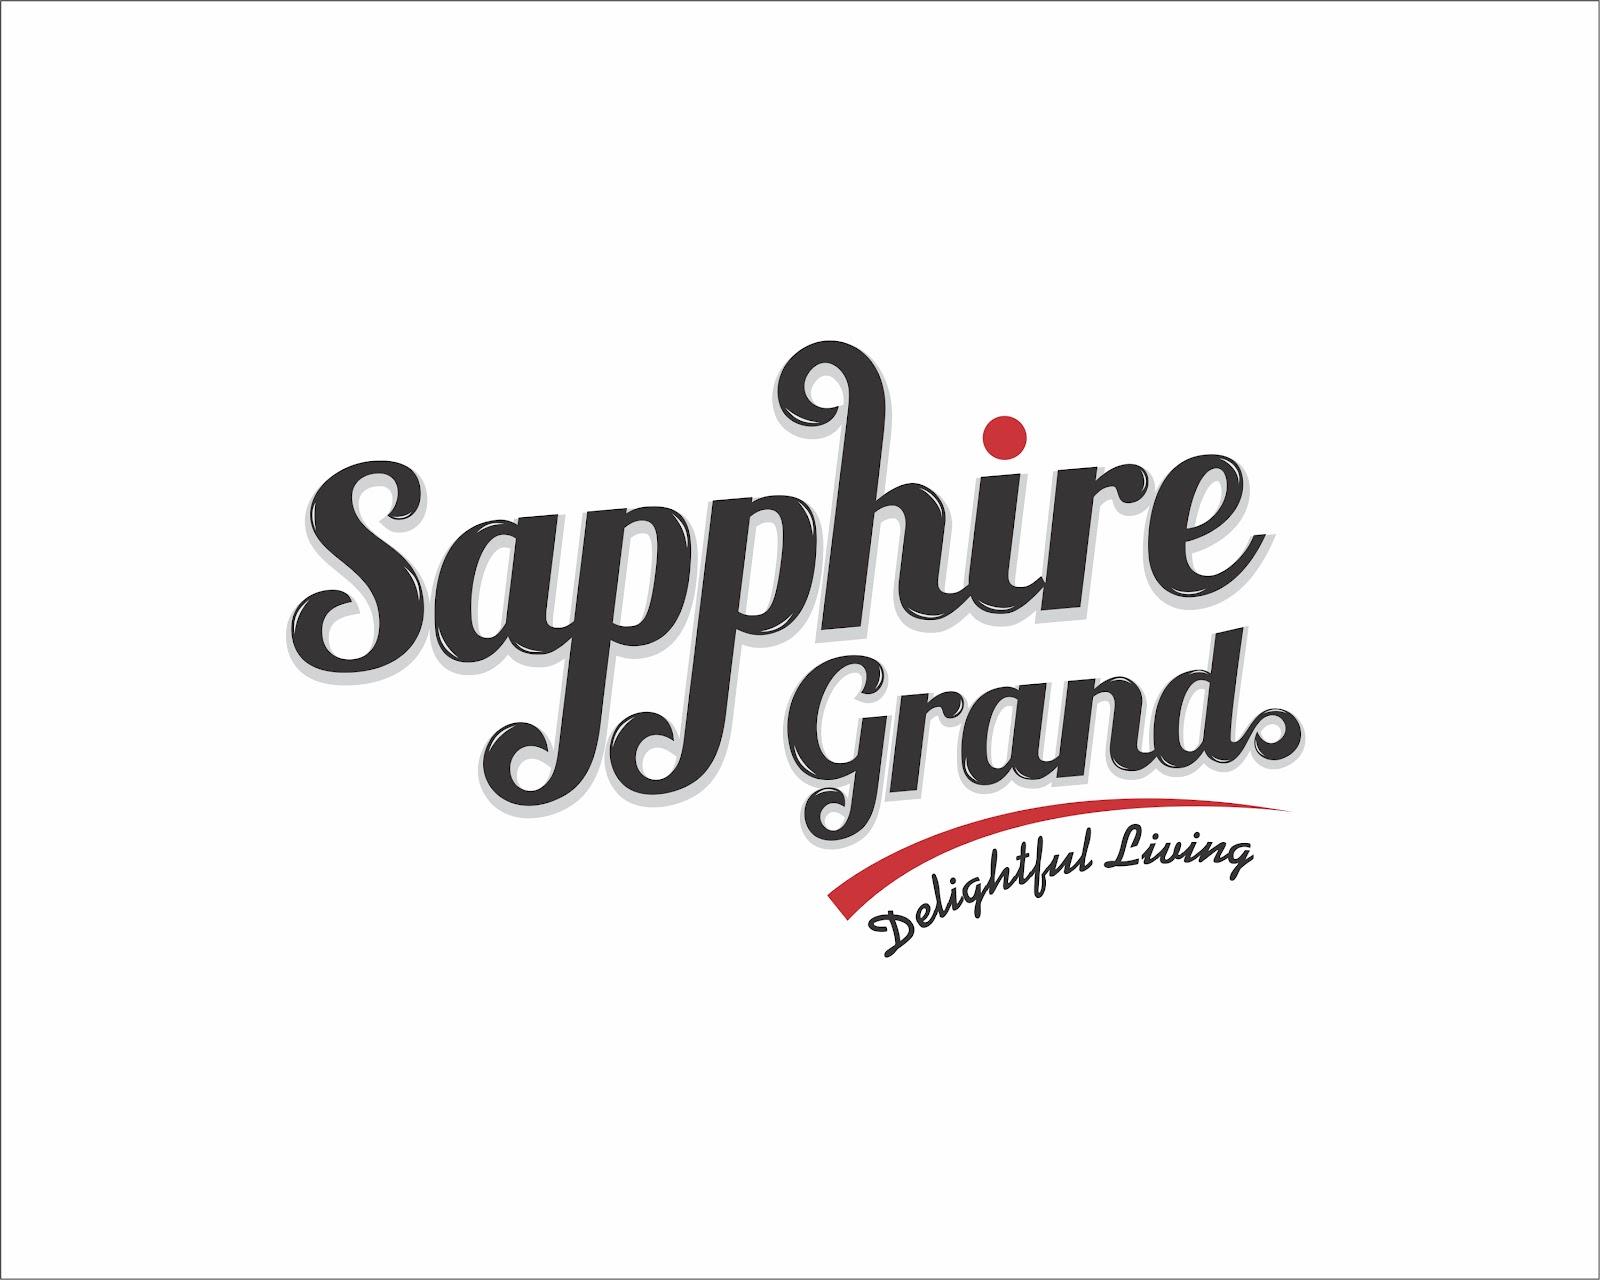 Freelance Graphic Designer: Sapphire Grand